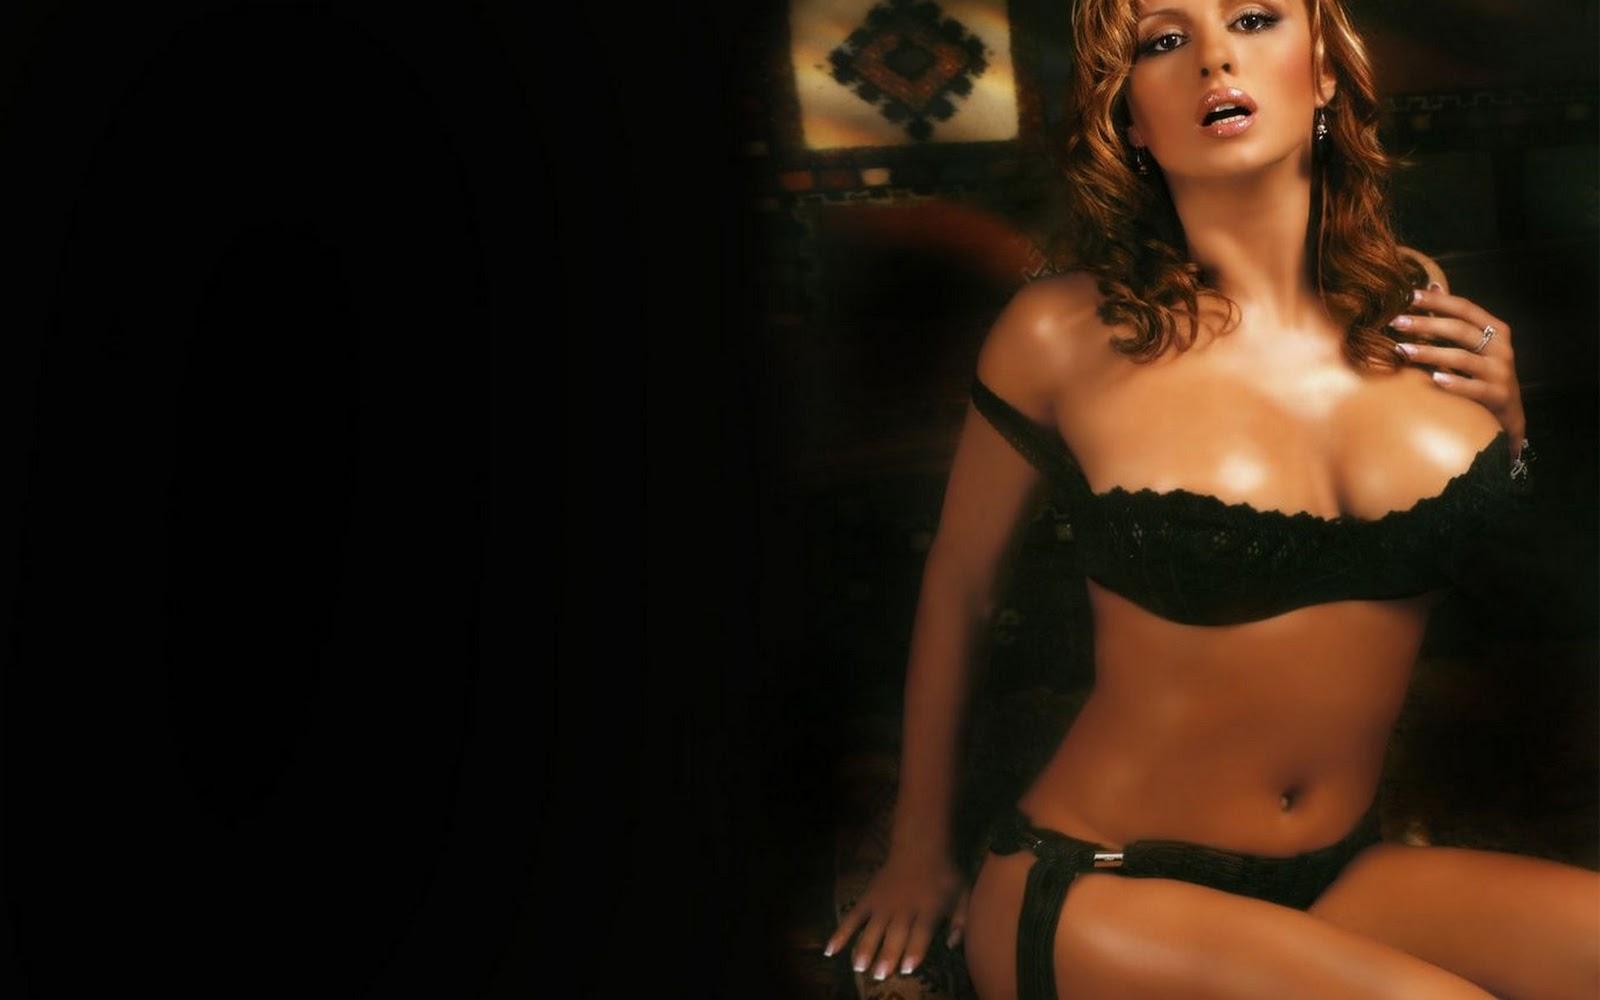 Лесби целуются в засос - видео / byclick @ Lust Flesh